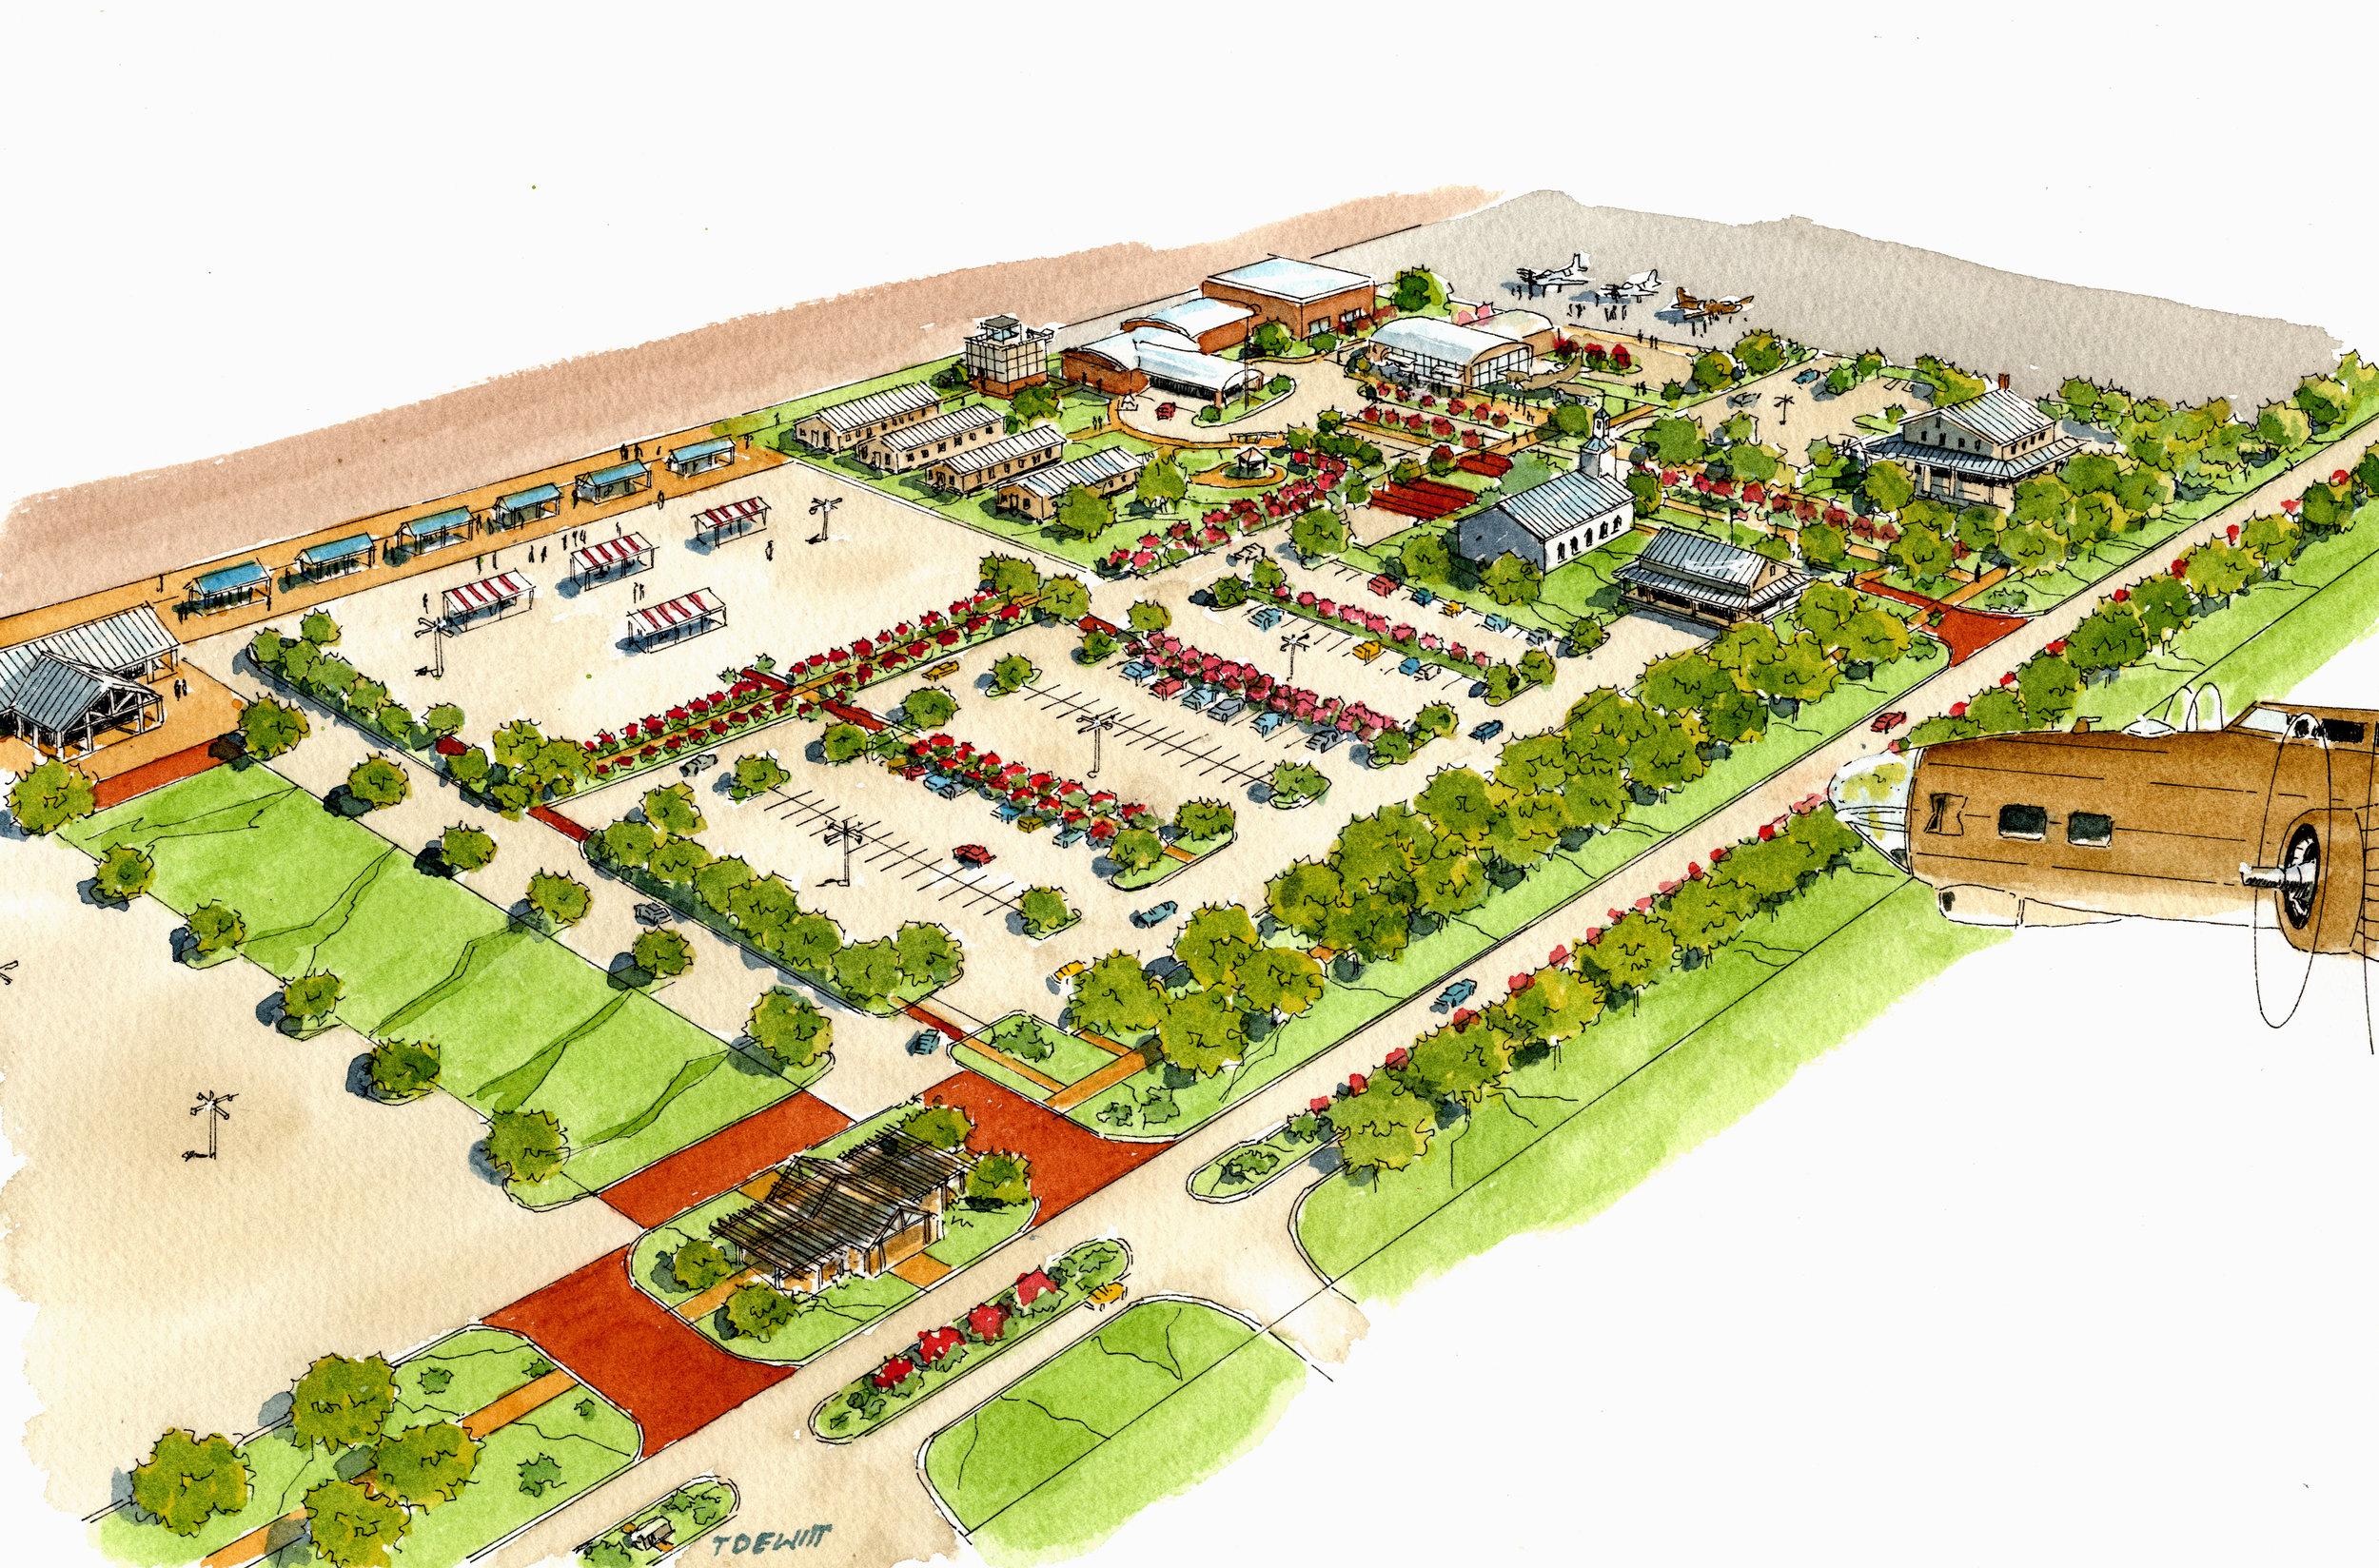 Stars & Stripes Village Master Plan in Halls, Tennessee